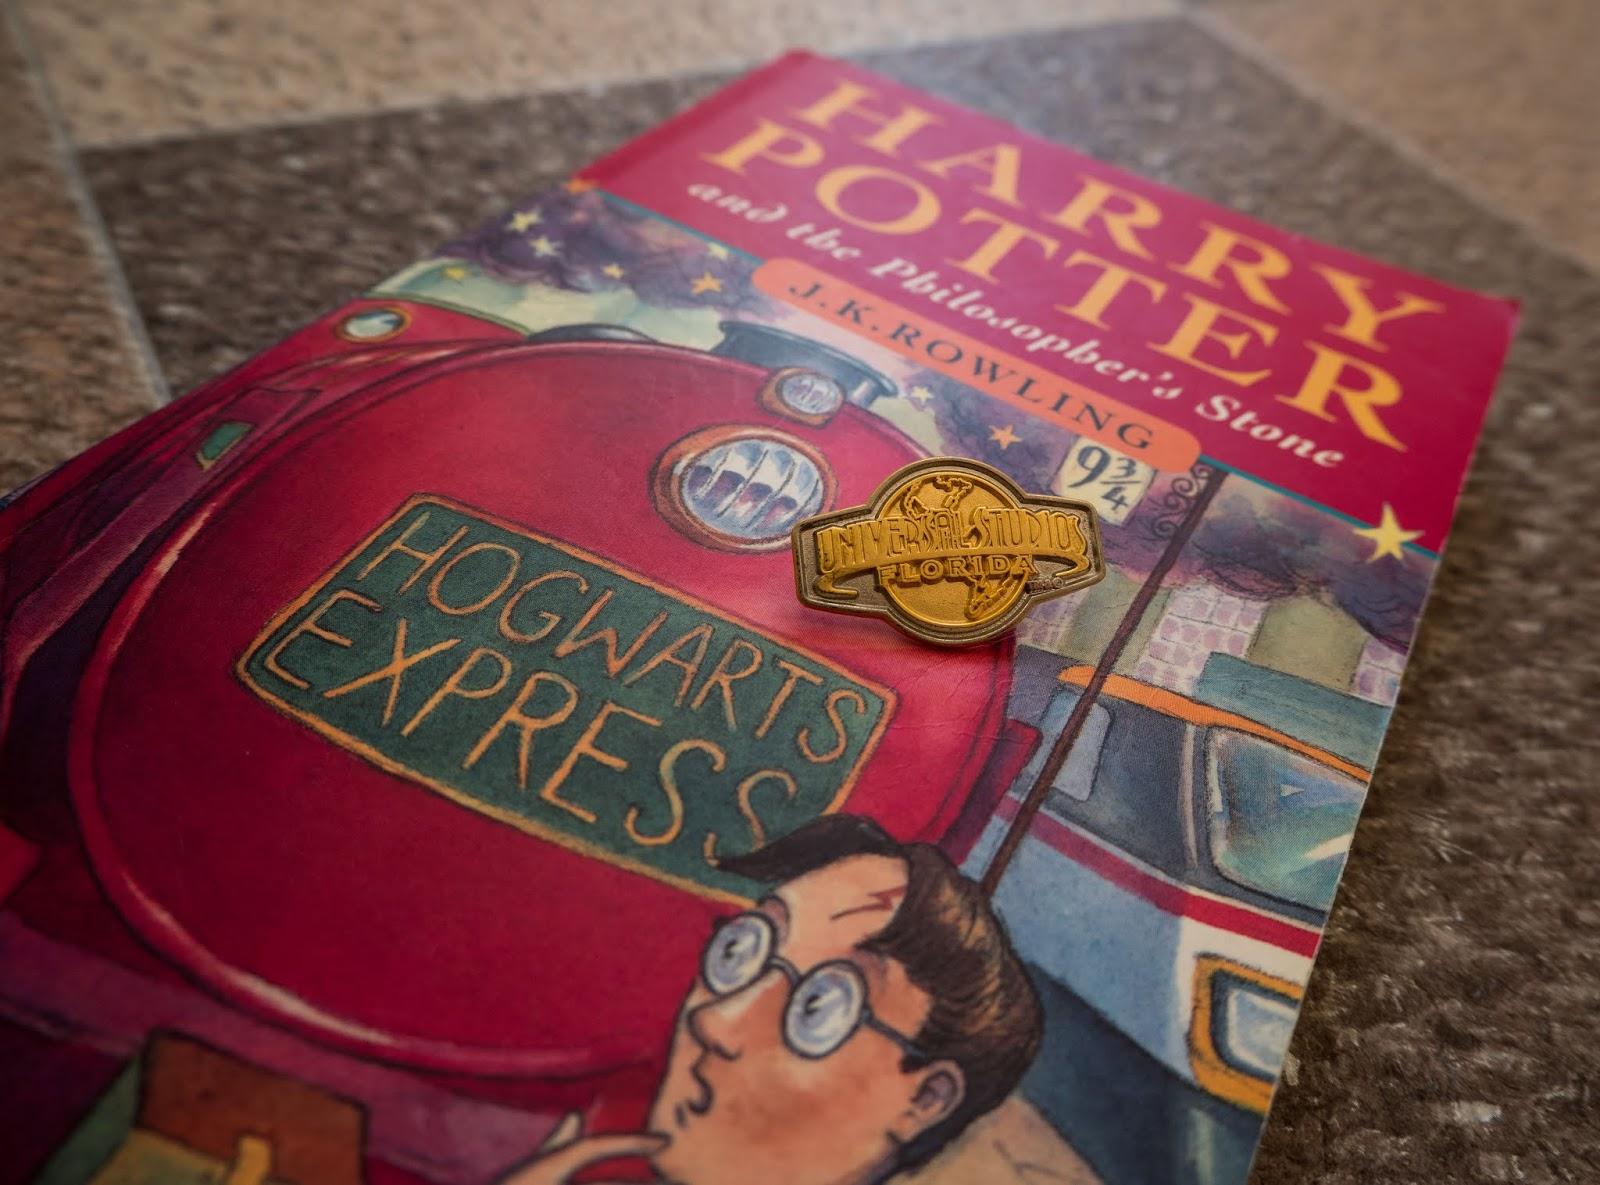 Harry Potter at Universal Studios Orlando, Florida